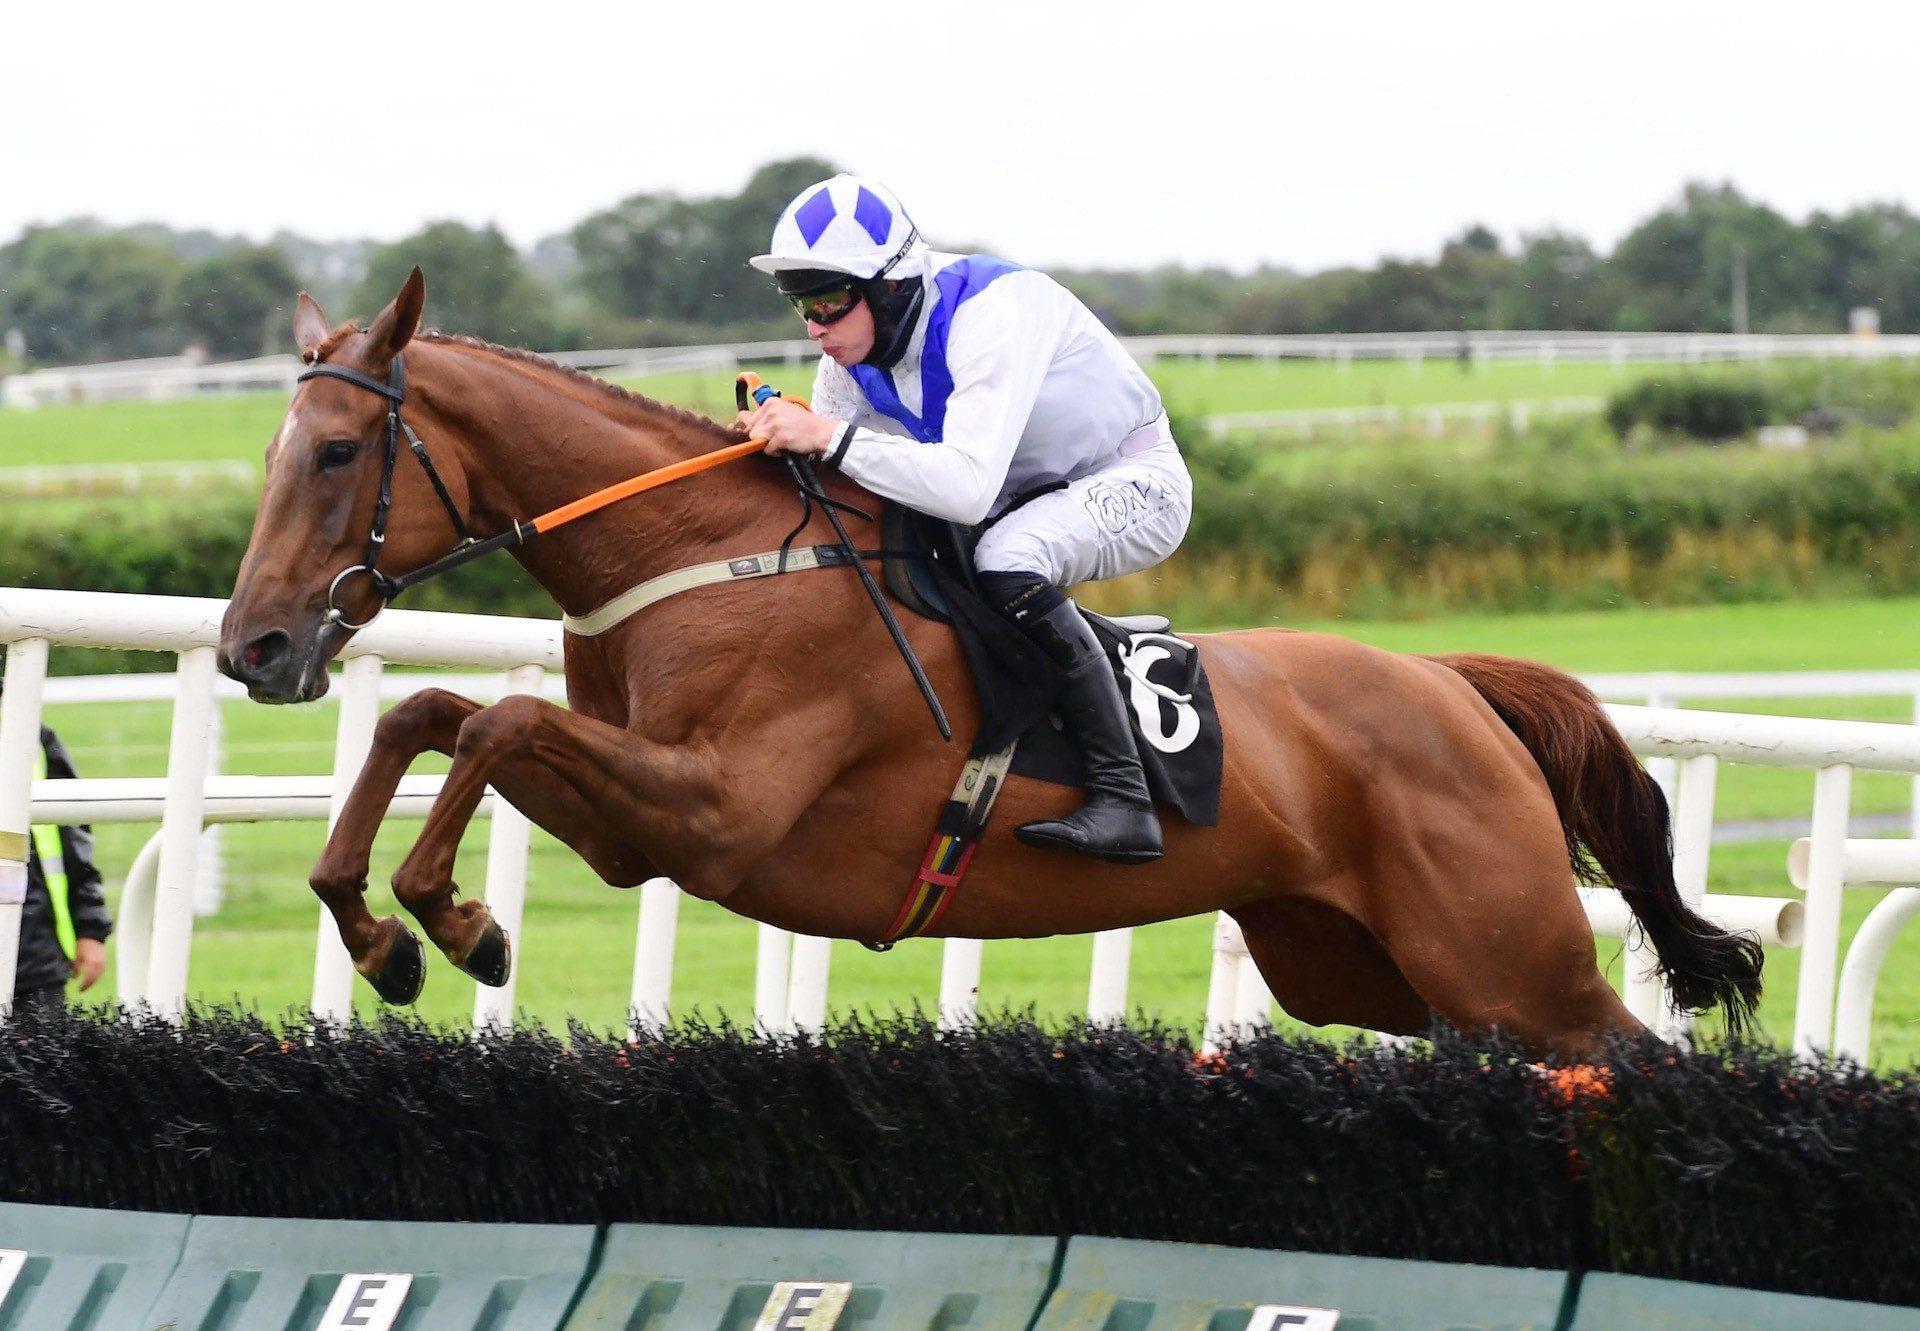 Apple Crumble (Getaway) Wins The Novices Hurdle At Kilbeggan